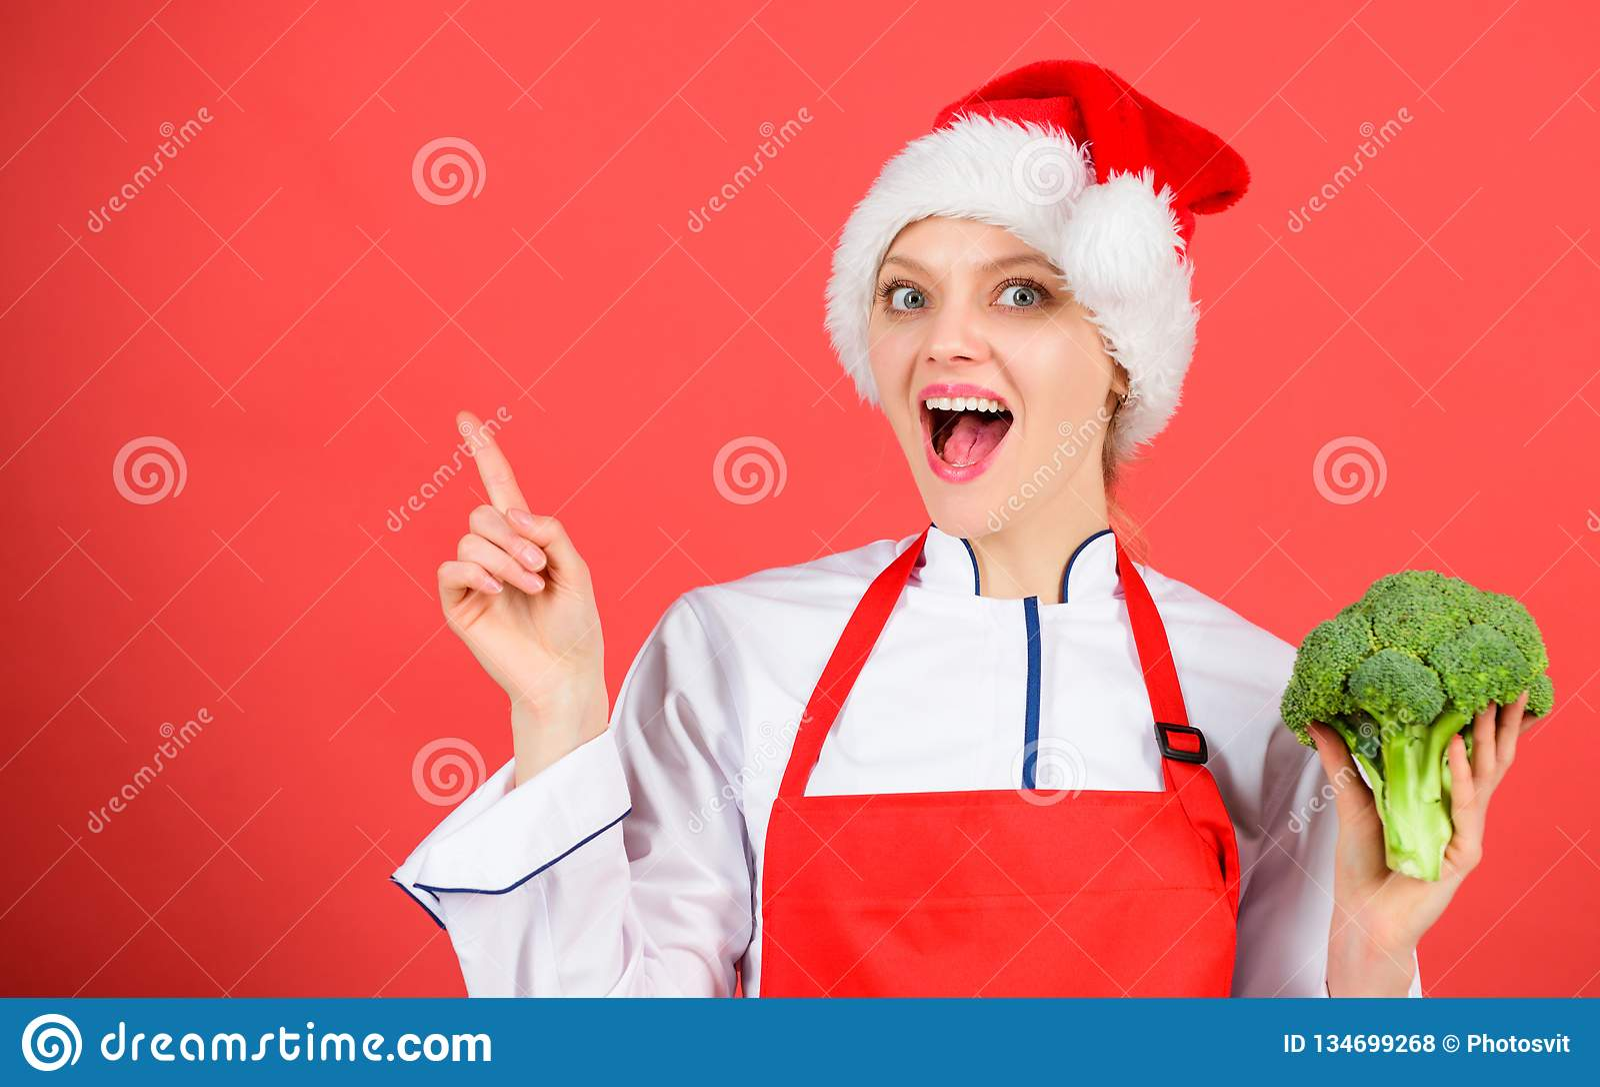 Christmas Menu Woman Chef Cooking Christmas Dinner Wear Santa Hat